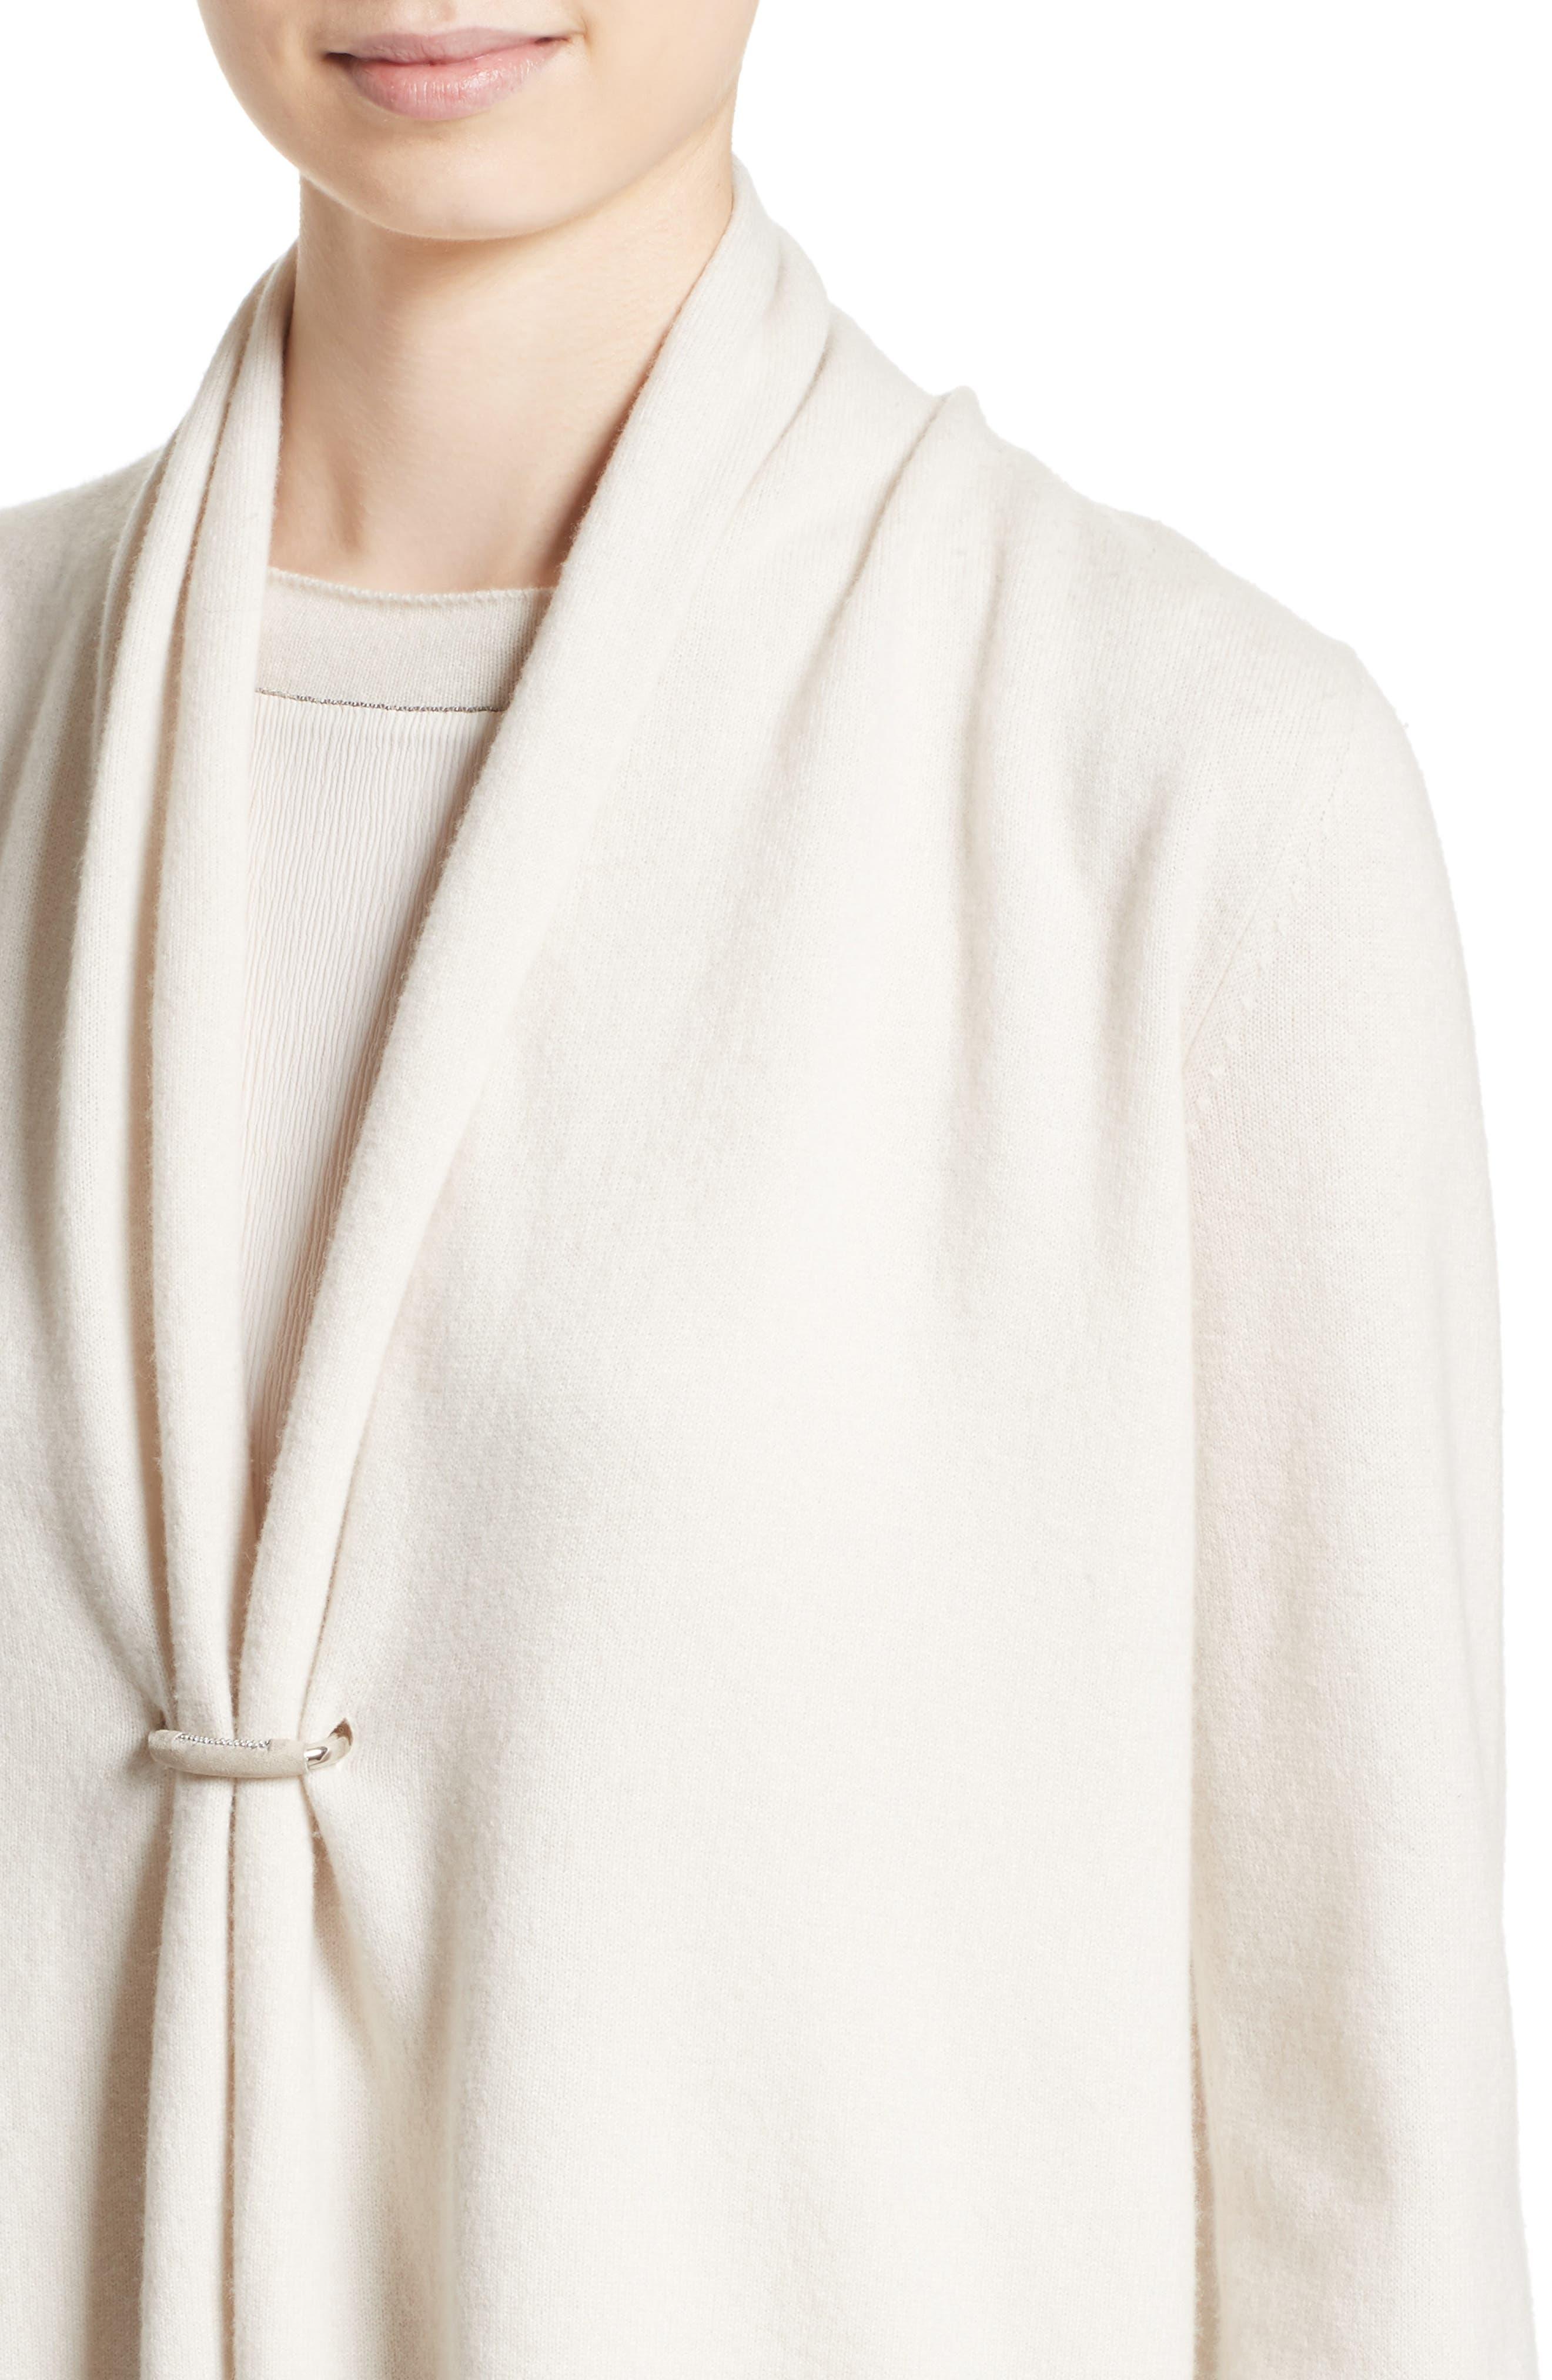 Wool, Silk & Cashmere Shawl Collar Cardigan,                             Alternate thumbnail 4, color,                             101